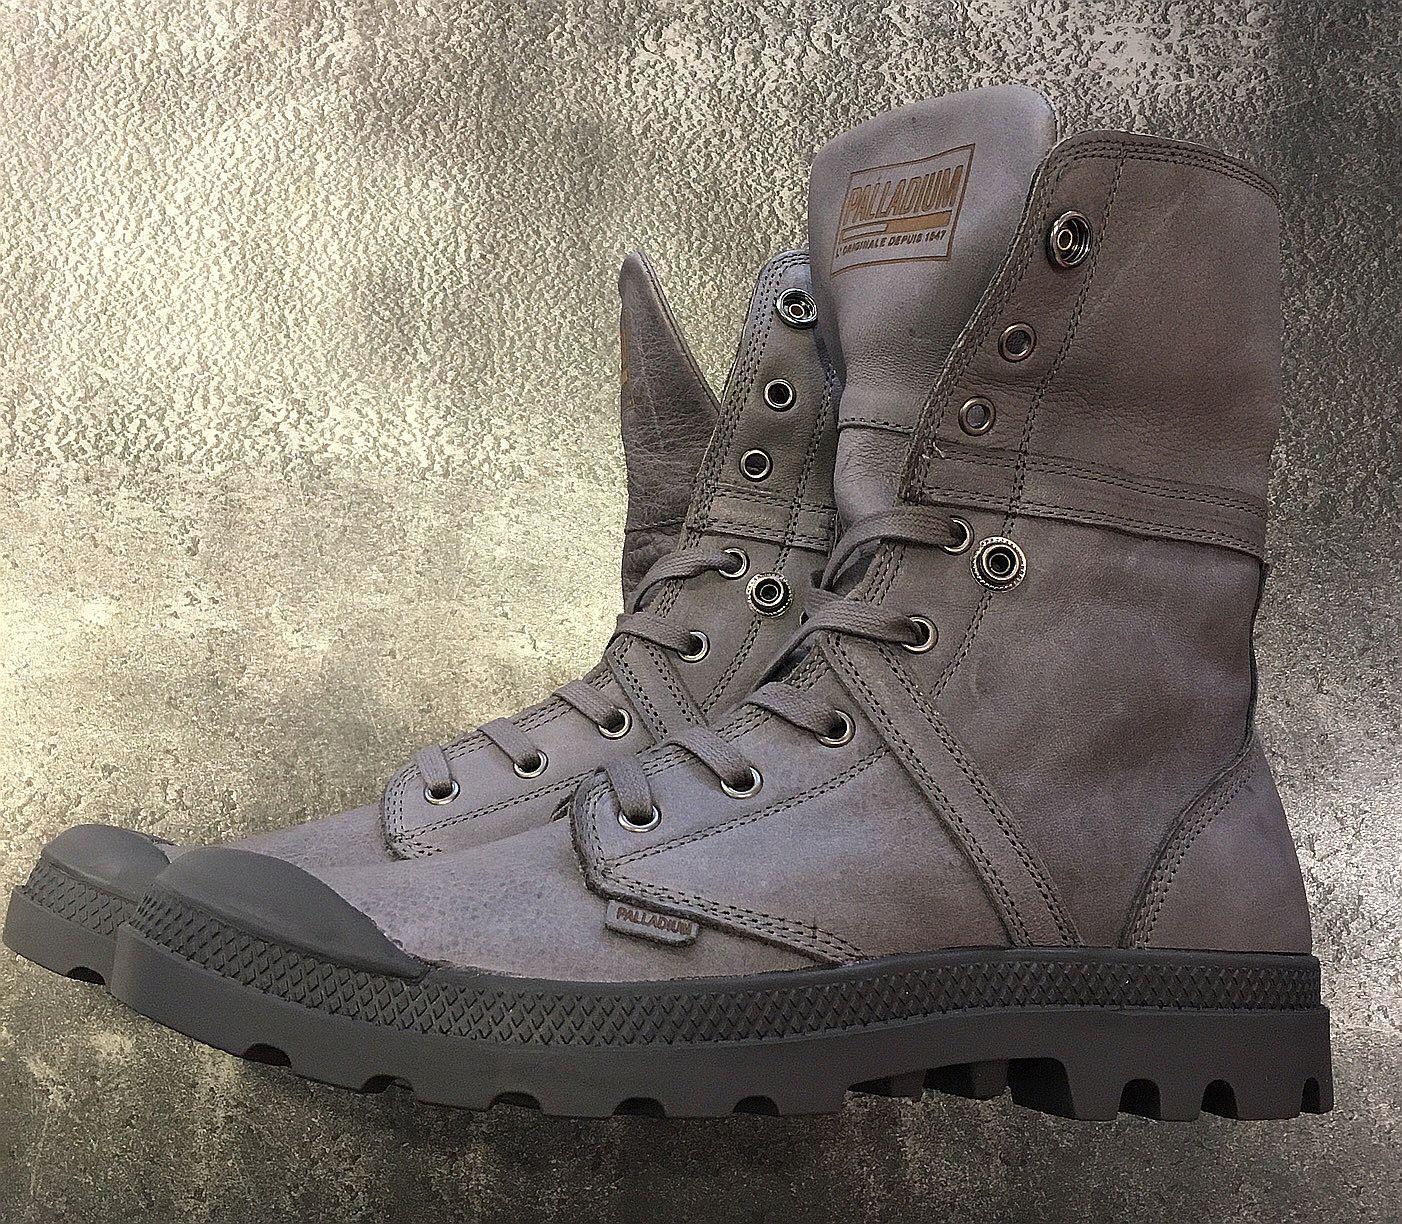 Palladium zapatos botas  pallabrouse baggy  cuero FB. French metal